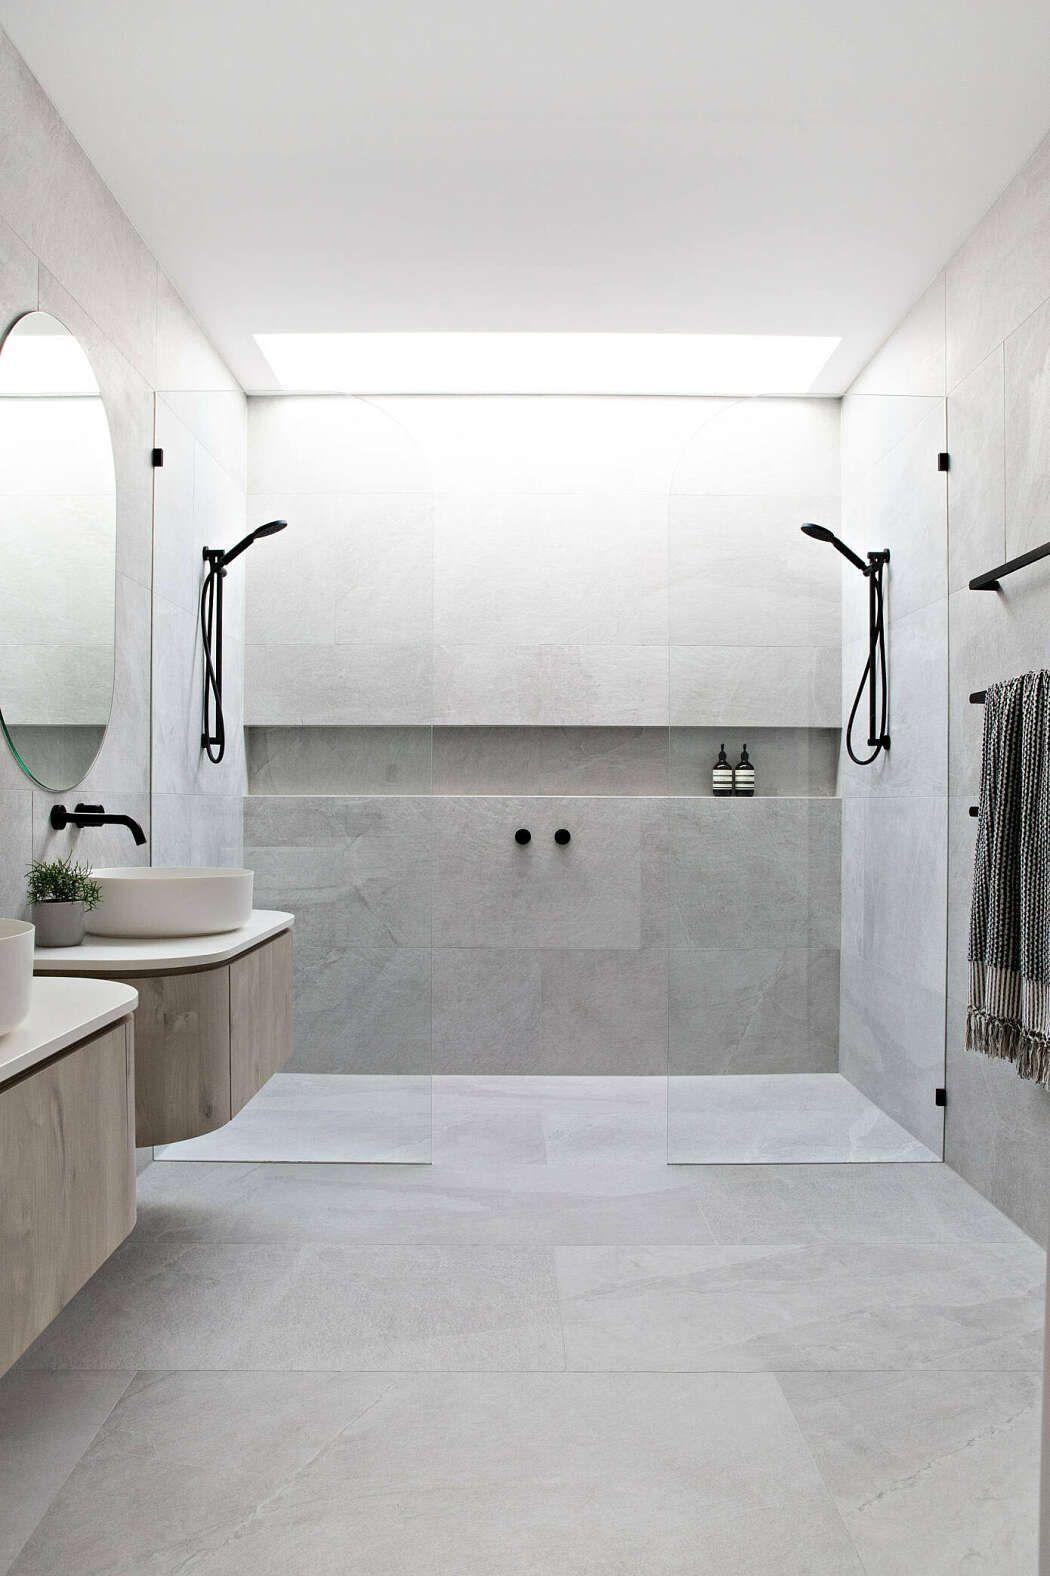 Teal Ave Duplex By Luxbuilt Homeadore Modernbathroom In 2020 Modern Bathroom Modern Bathroom Design Bathroom Interior Design